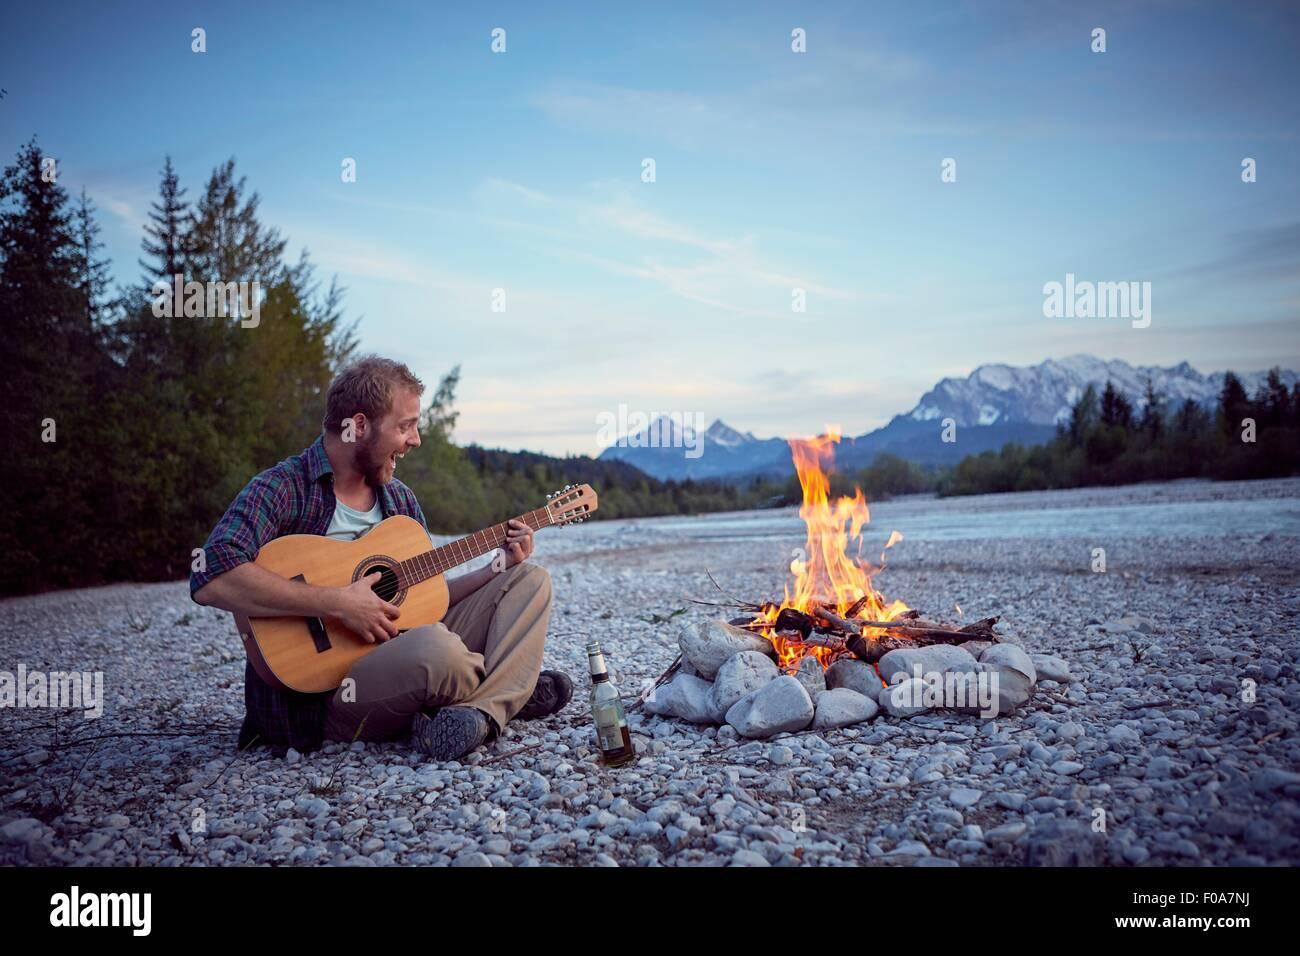 Young man sitting by campfire playing guitar, singing, Wallgau, Bavaria, Germany - Stock Image